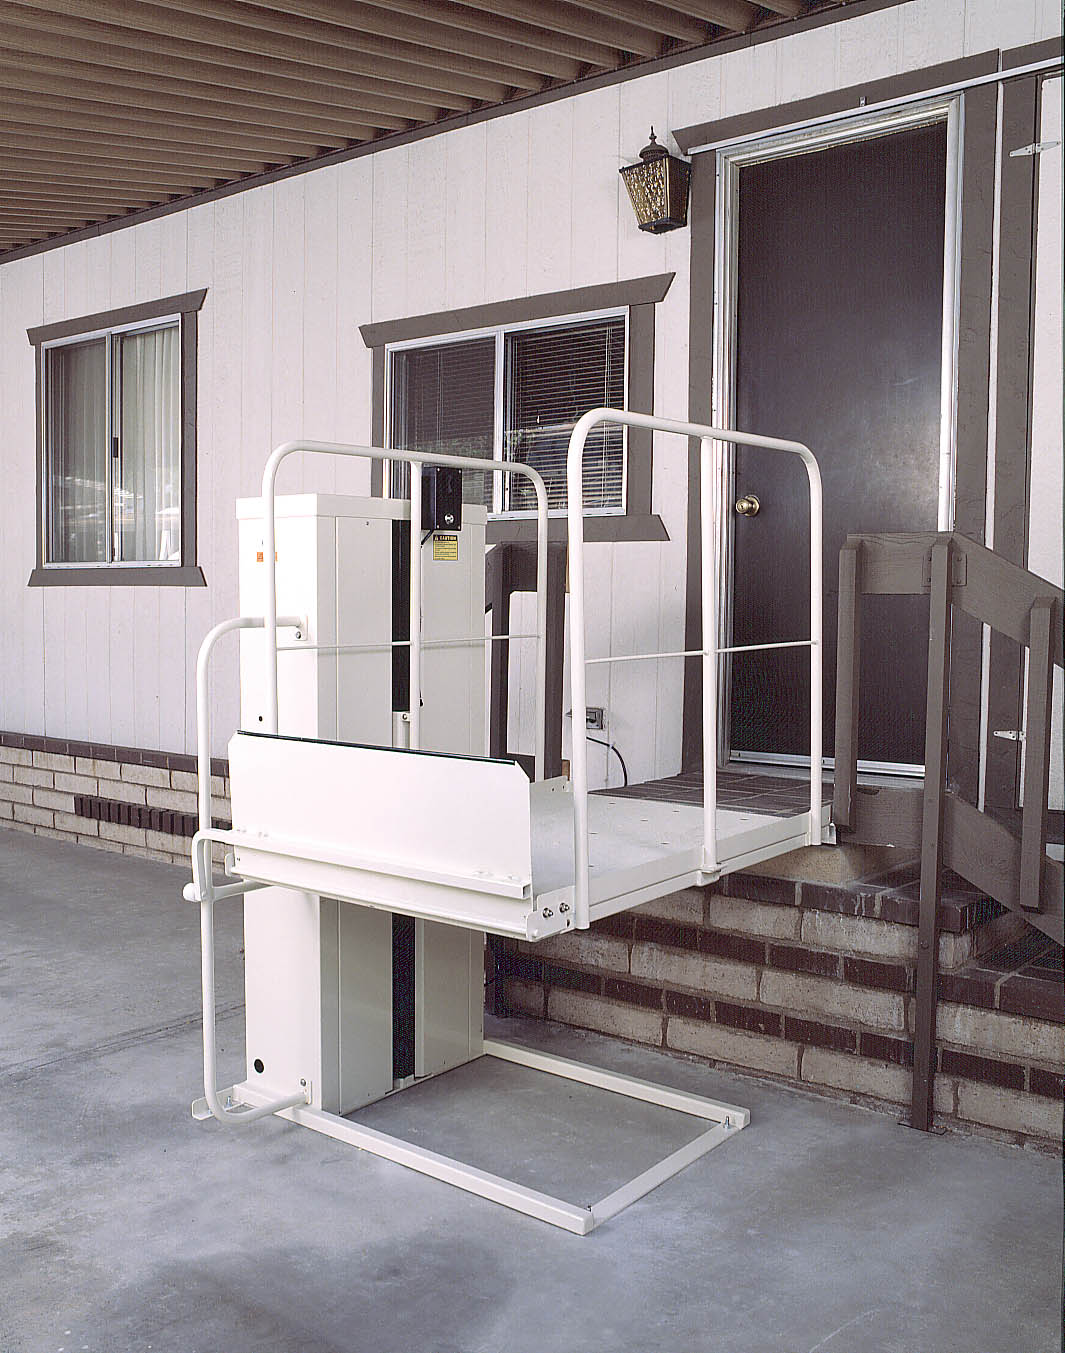 Vista scooter power bruno wheelchairs elevator lift harmar